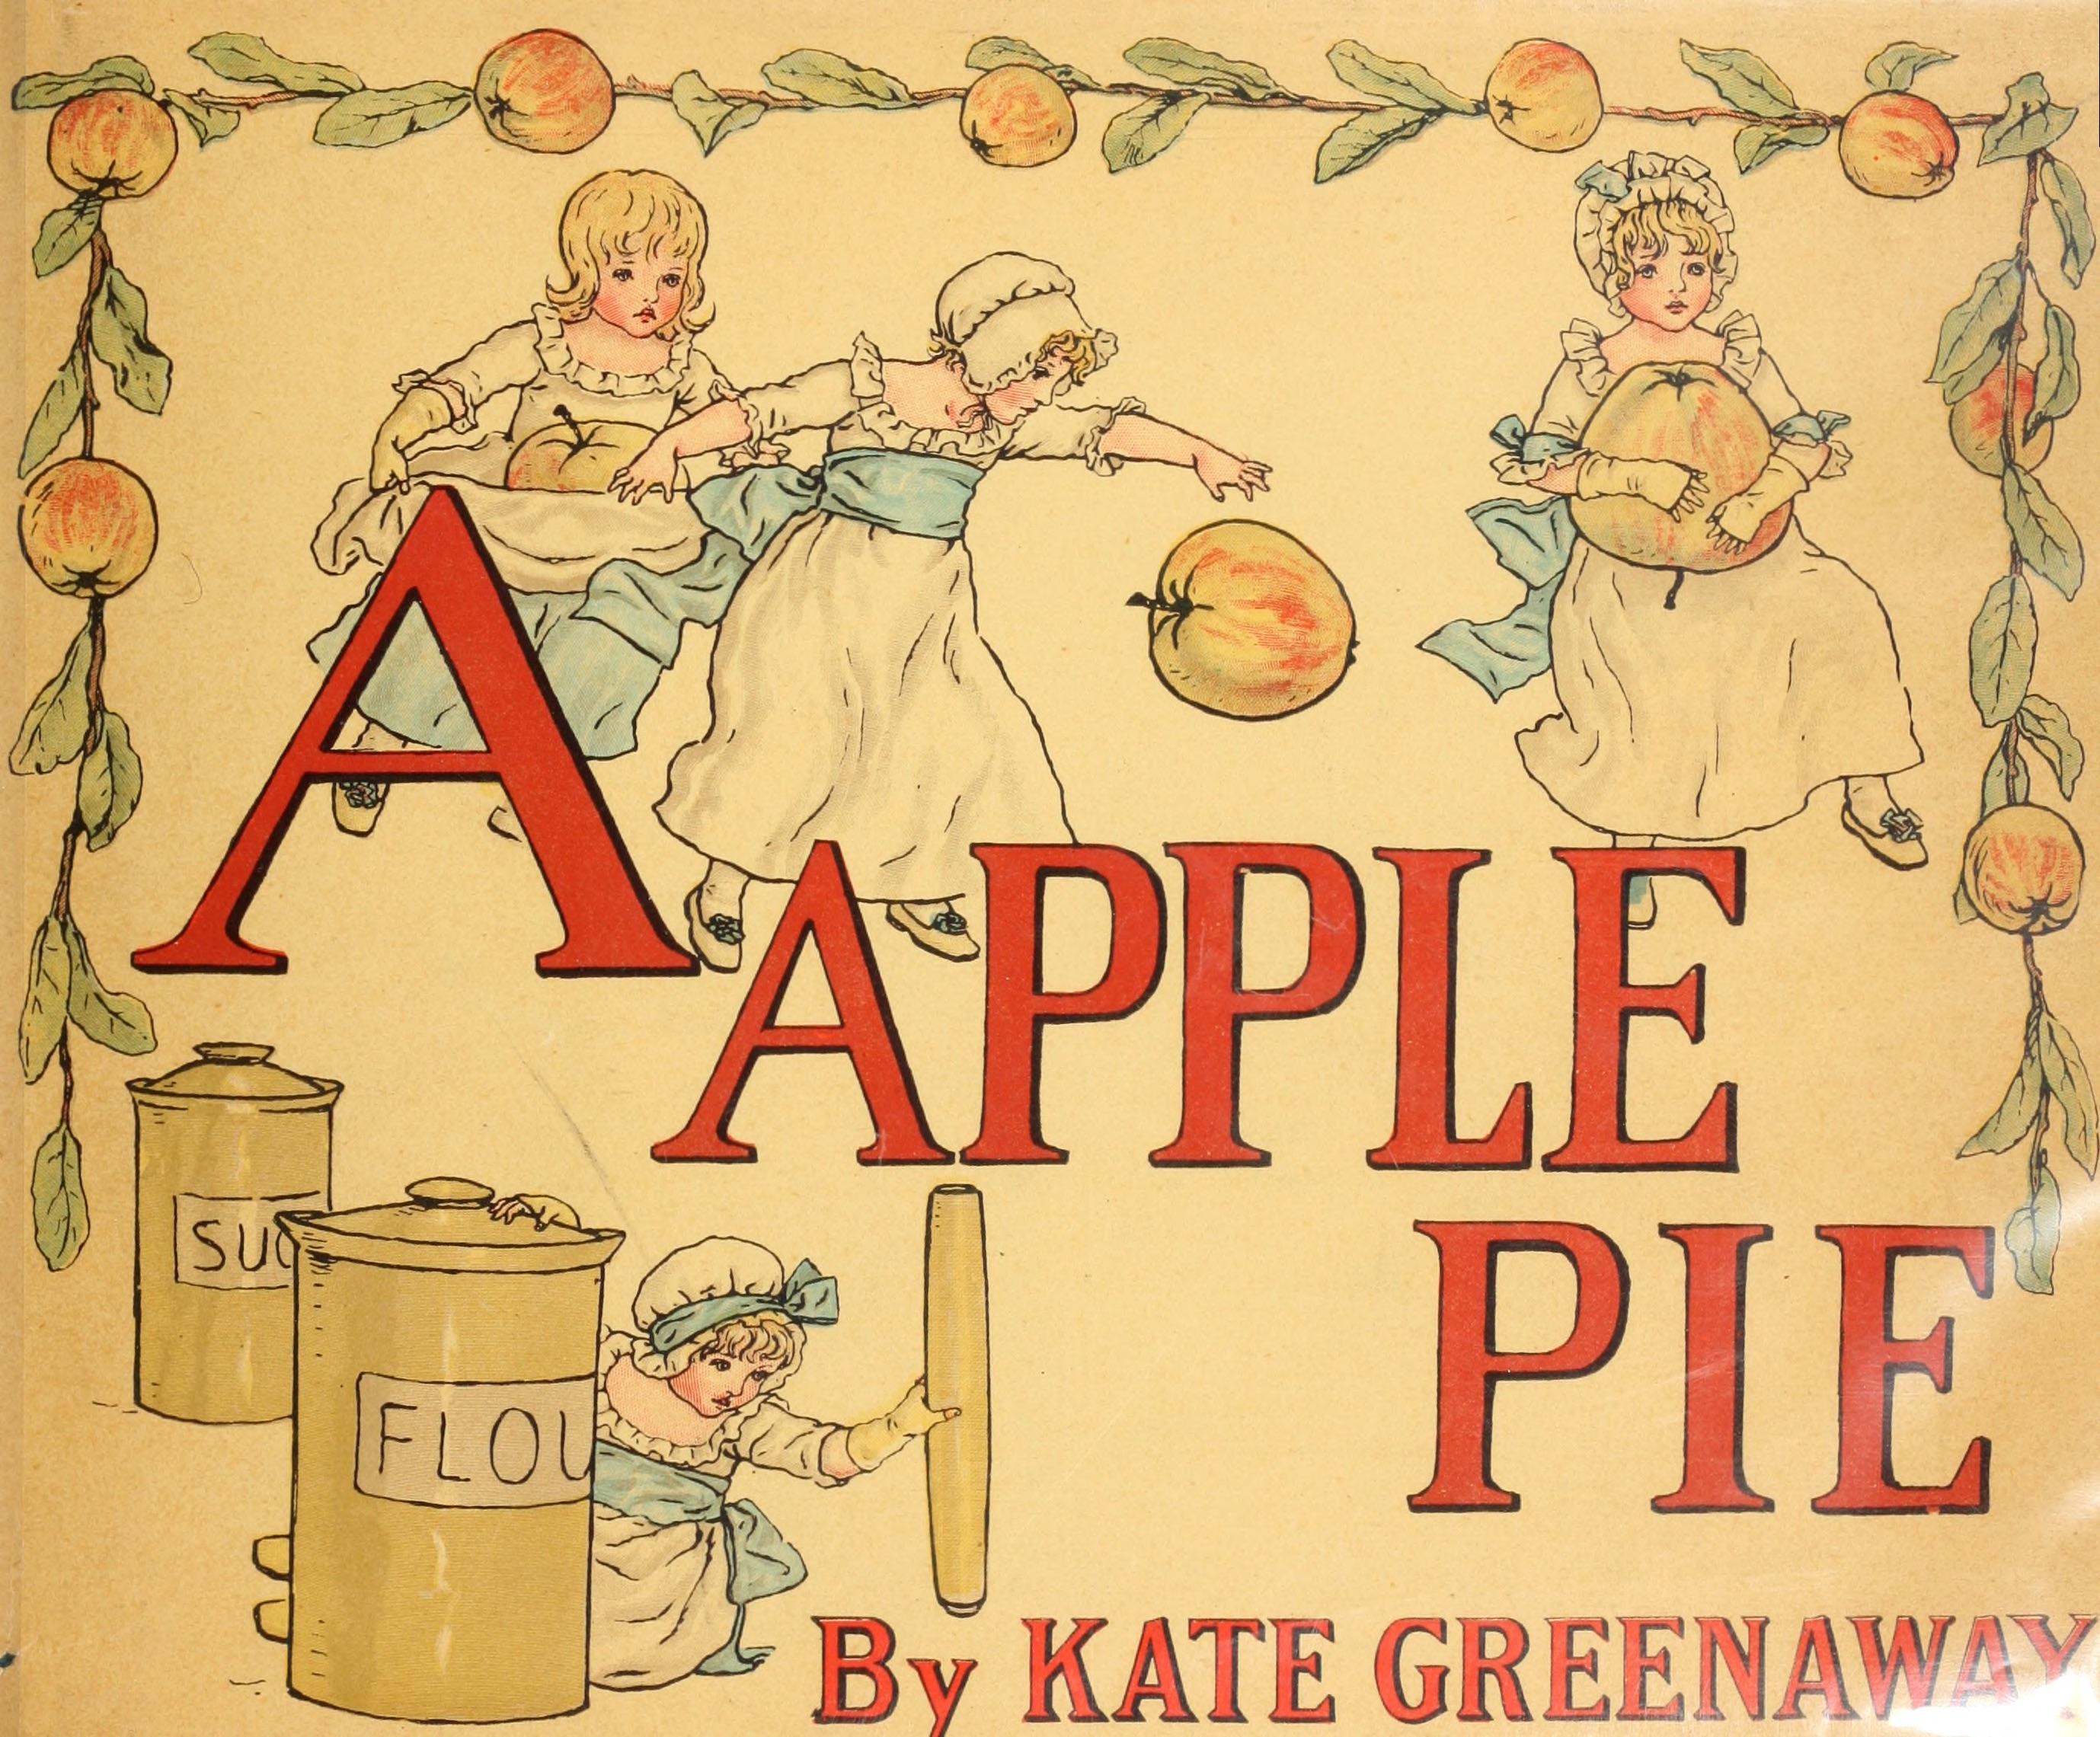 A_Apple_Pie_1886_Kate_Greenaway_00020.jpeg